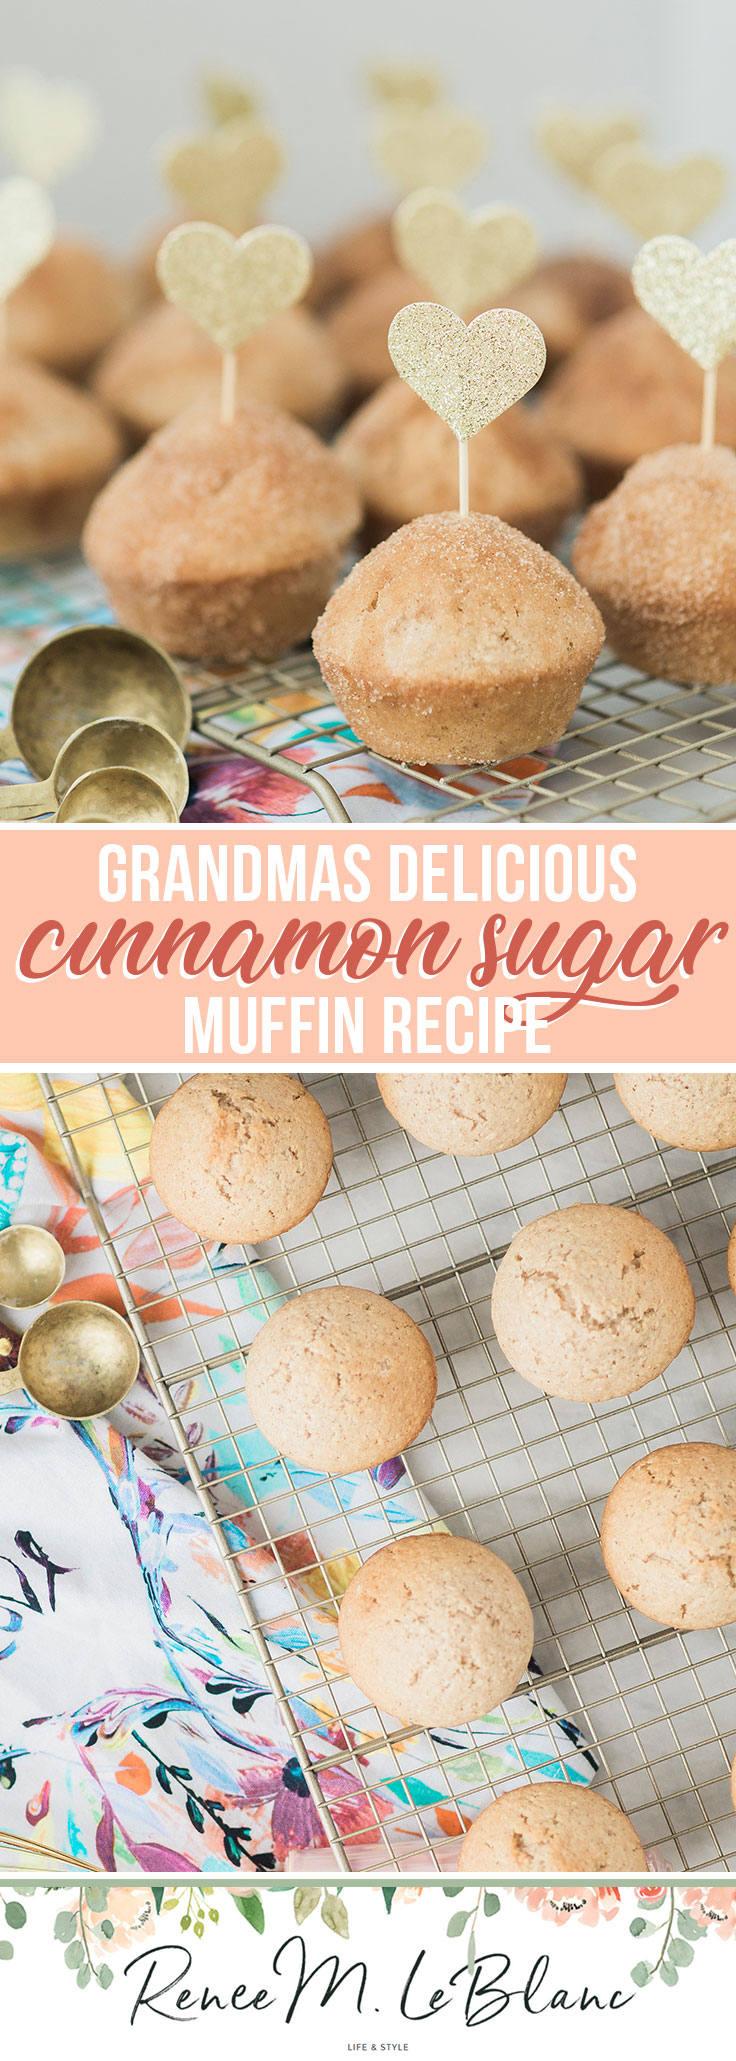 Grandmas World Famous Cinnamon Sugar Muffins!